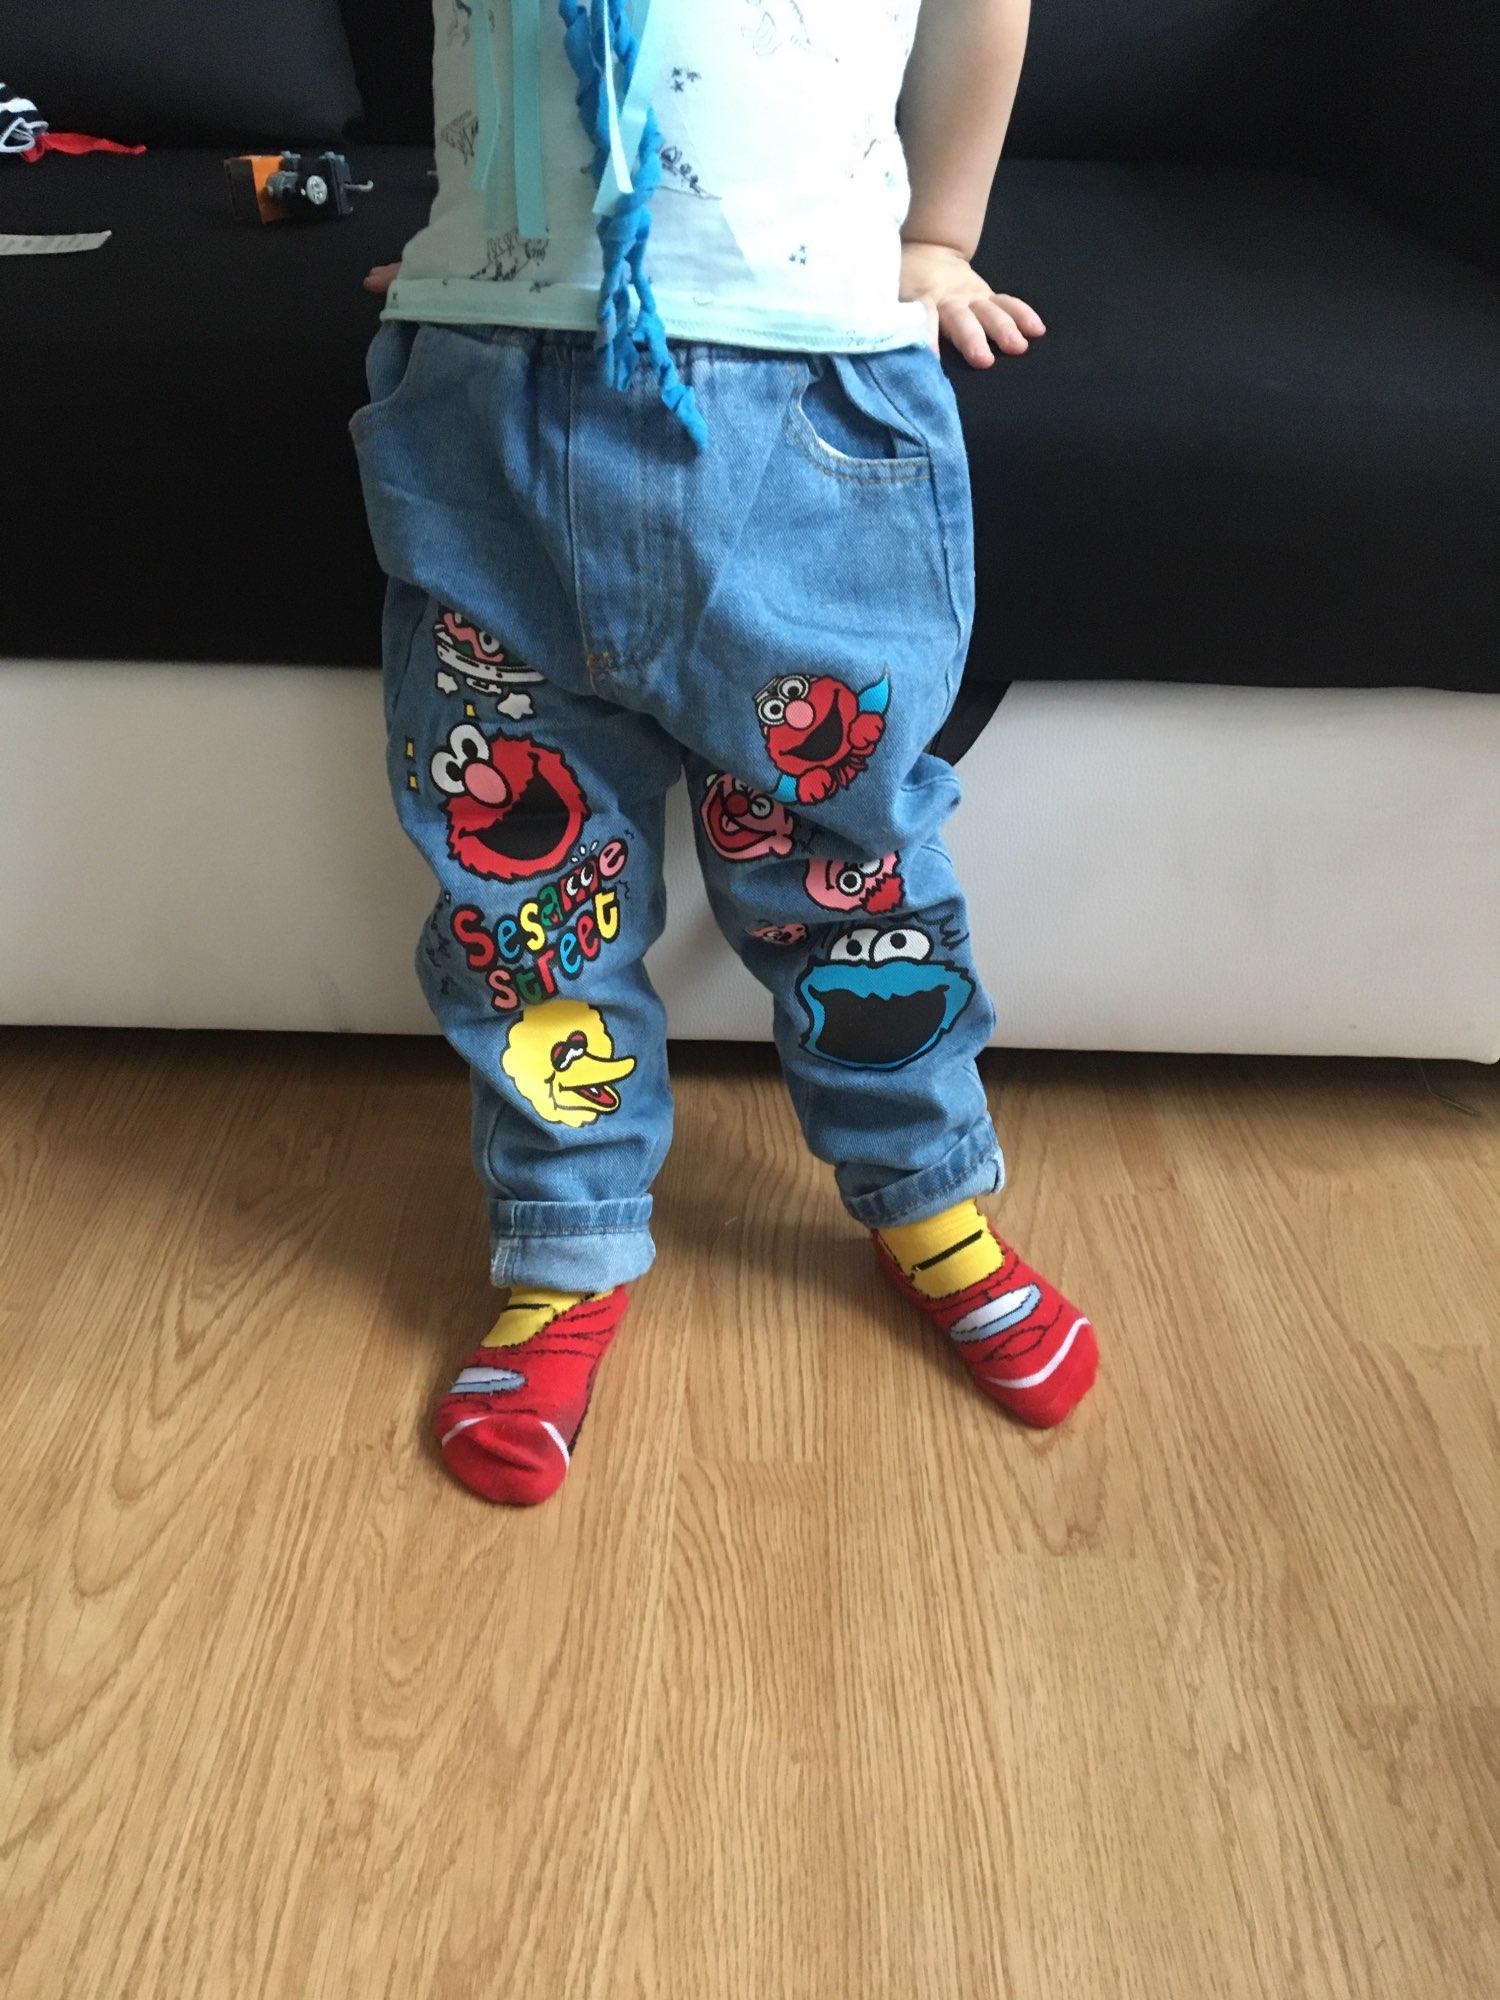 Brand Kids Cartoon Trousers Pant Fashion Girls Jeans Children Boys Jeans Kids Fashion Denim Pants Baby Jean Infant Clothing photo review